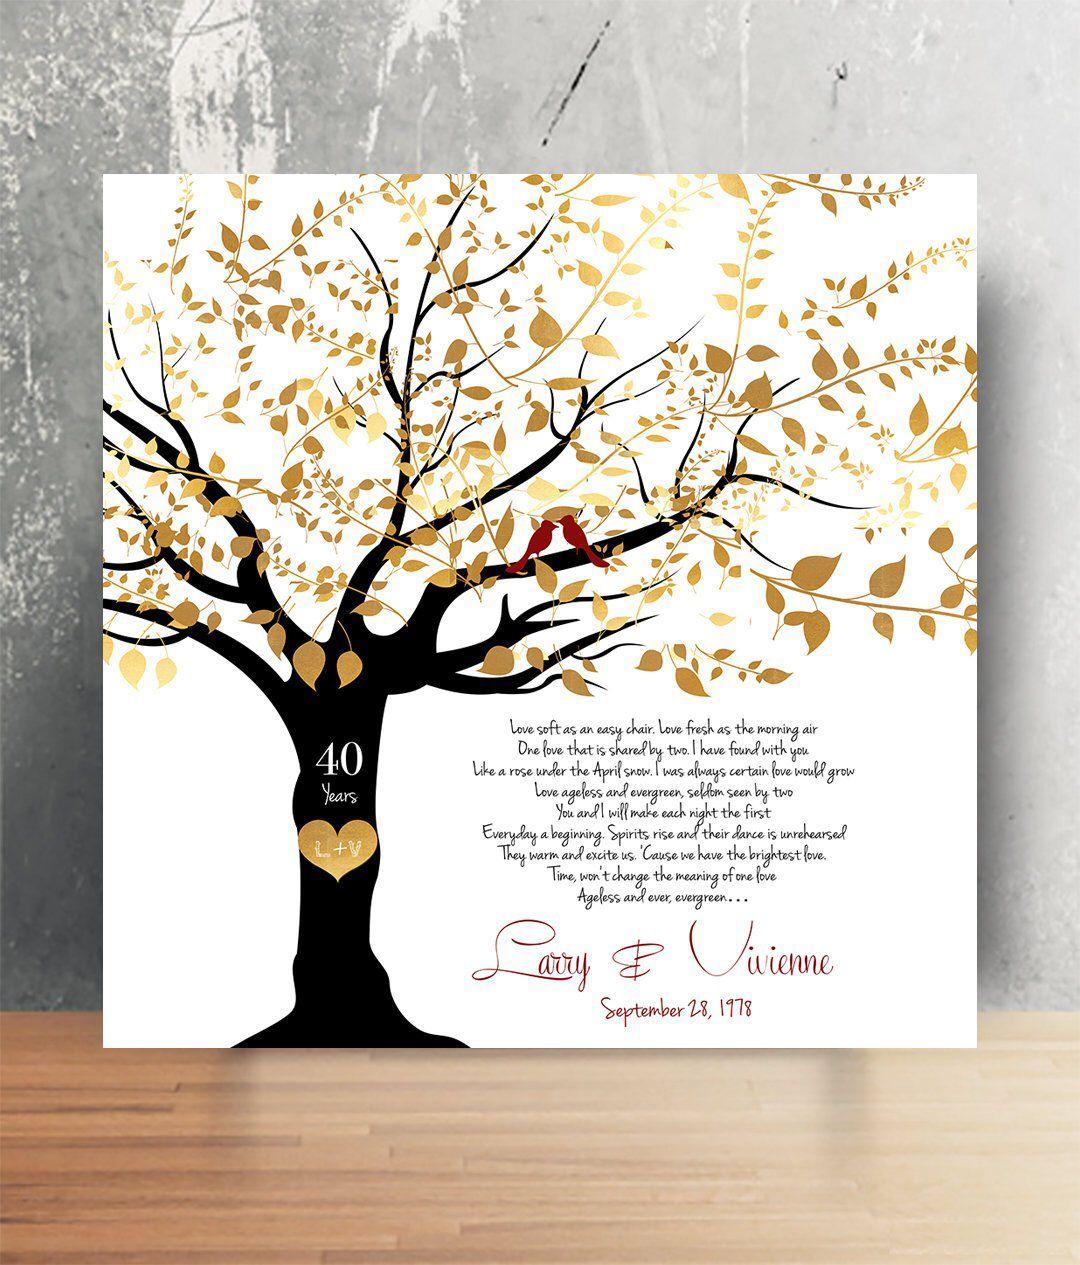 50th anniversary gift song lyric wall art 50th wedding